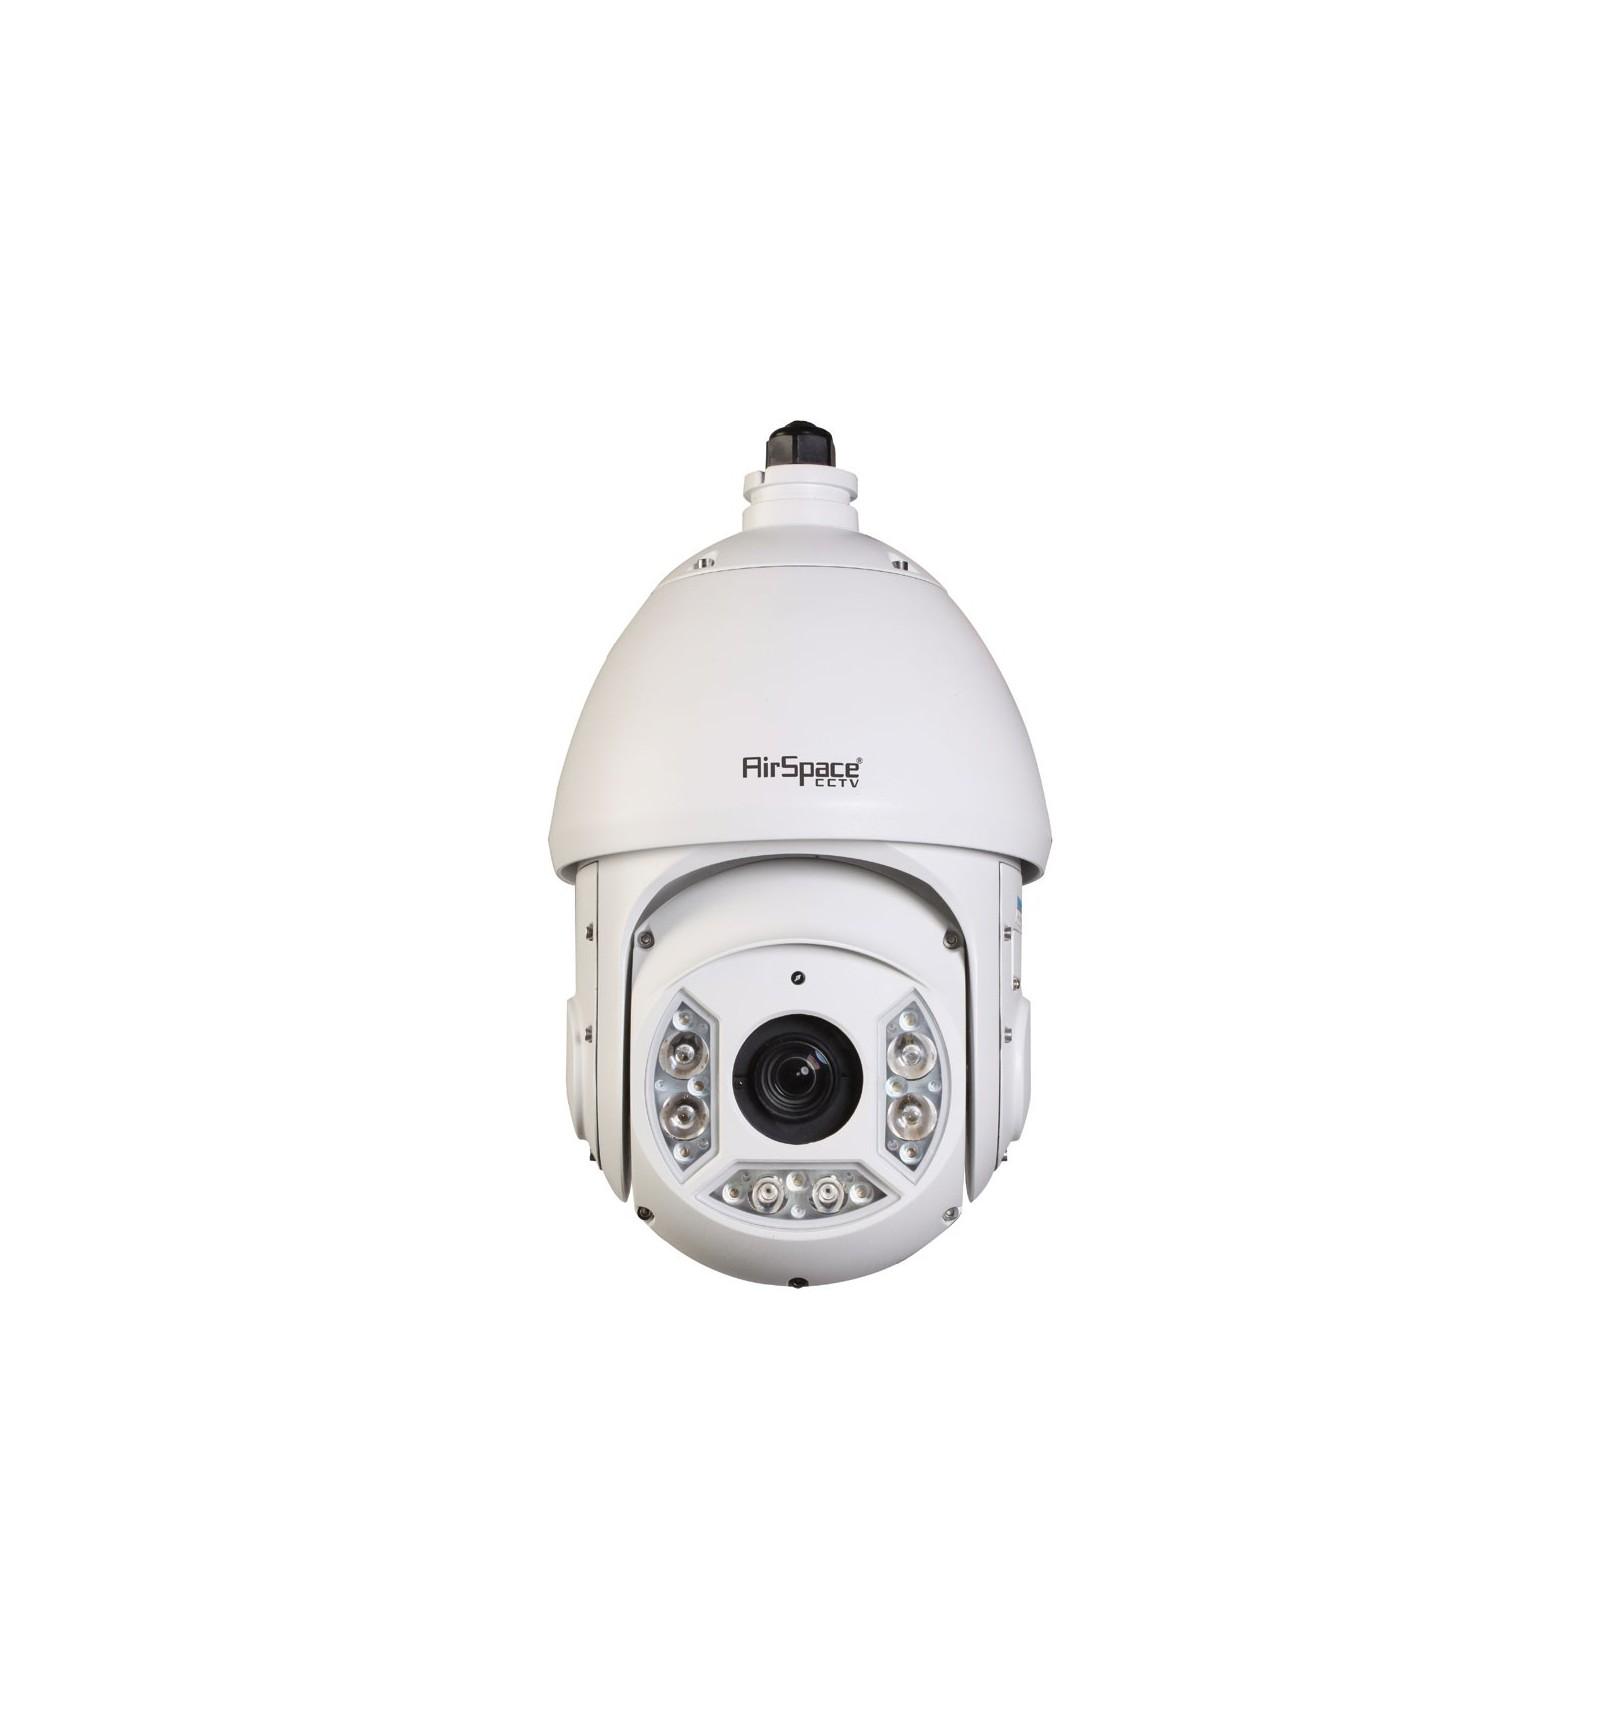 Camara cctv videovigilancia motorizada para exterior - Camaras videovigilancia exterior ...